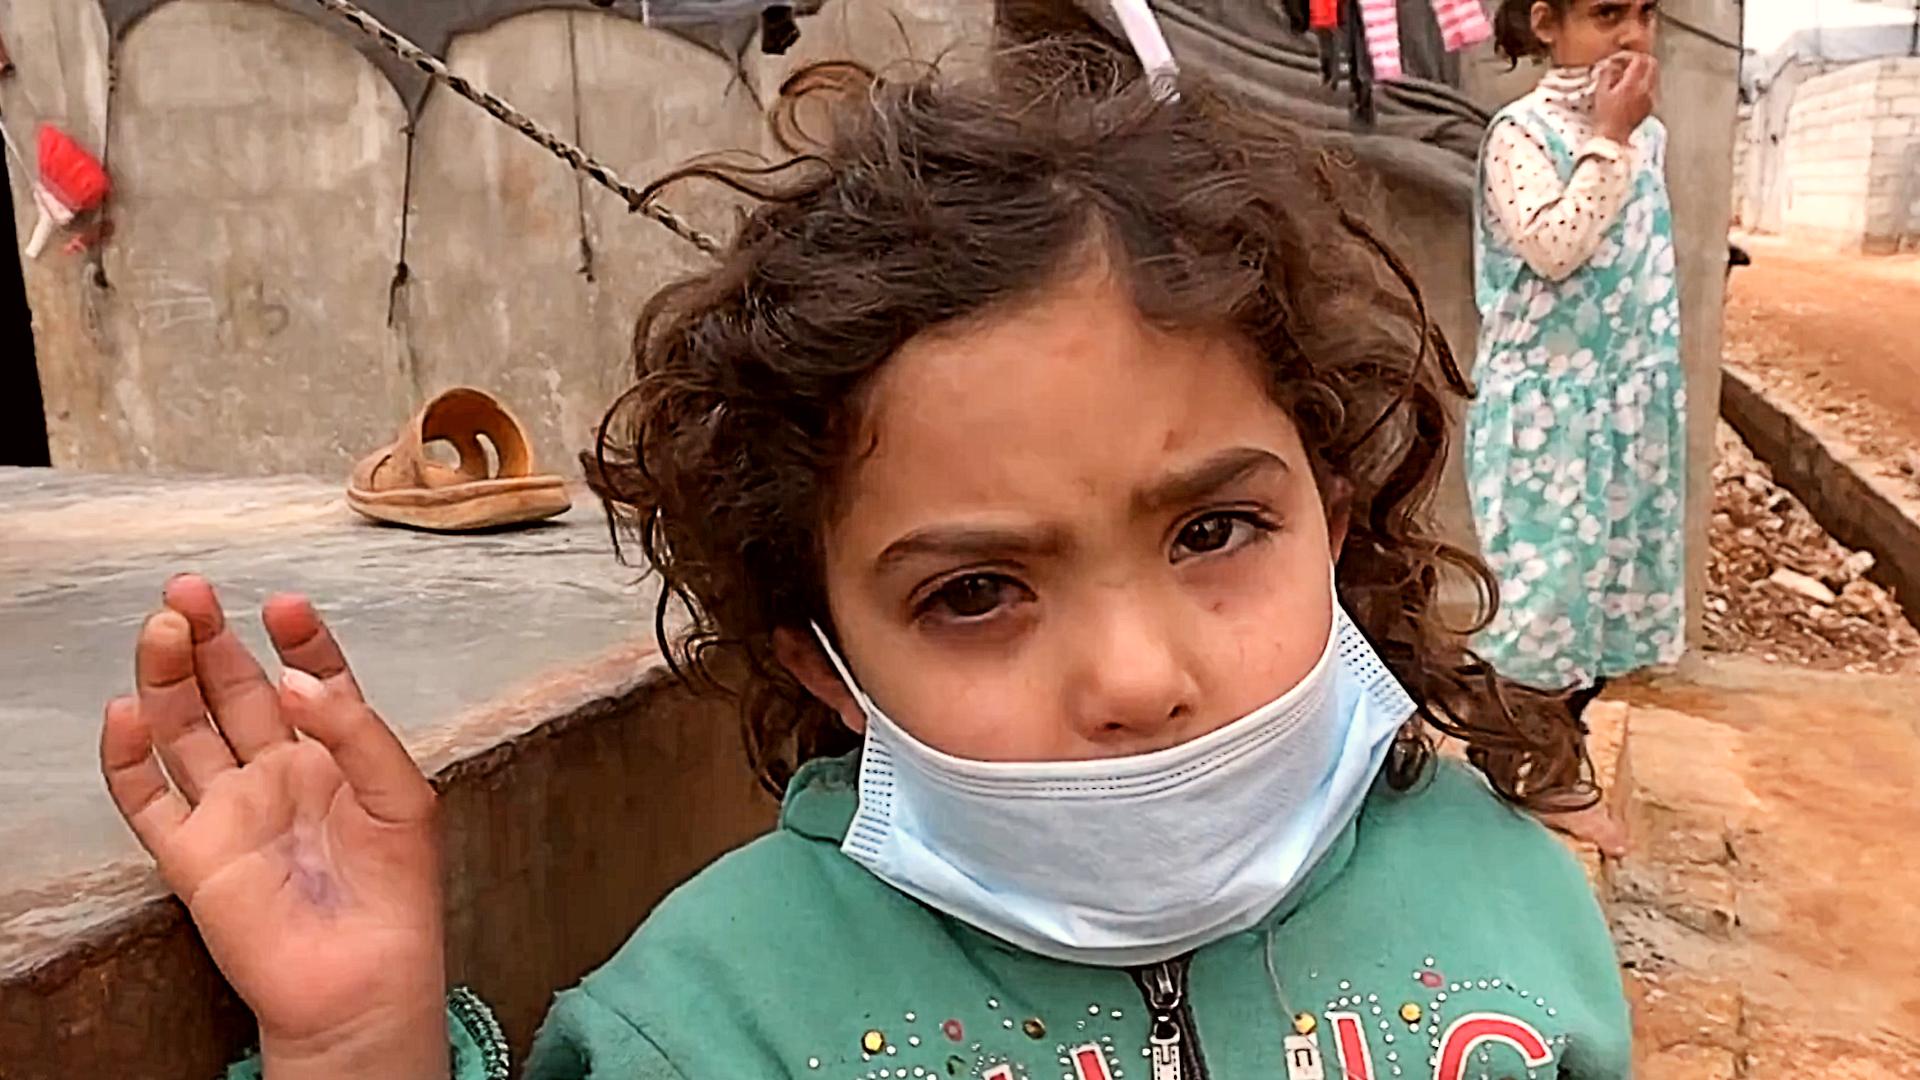 Coronavirus pandemic leaves refugees vulnerable